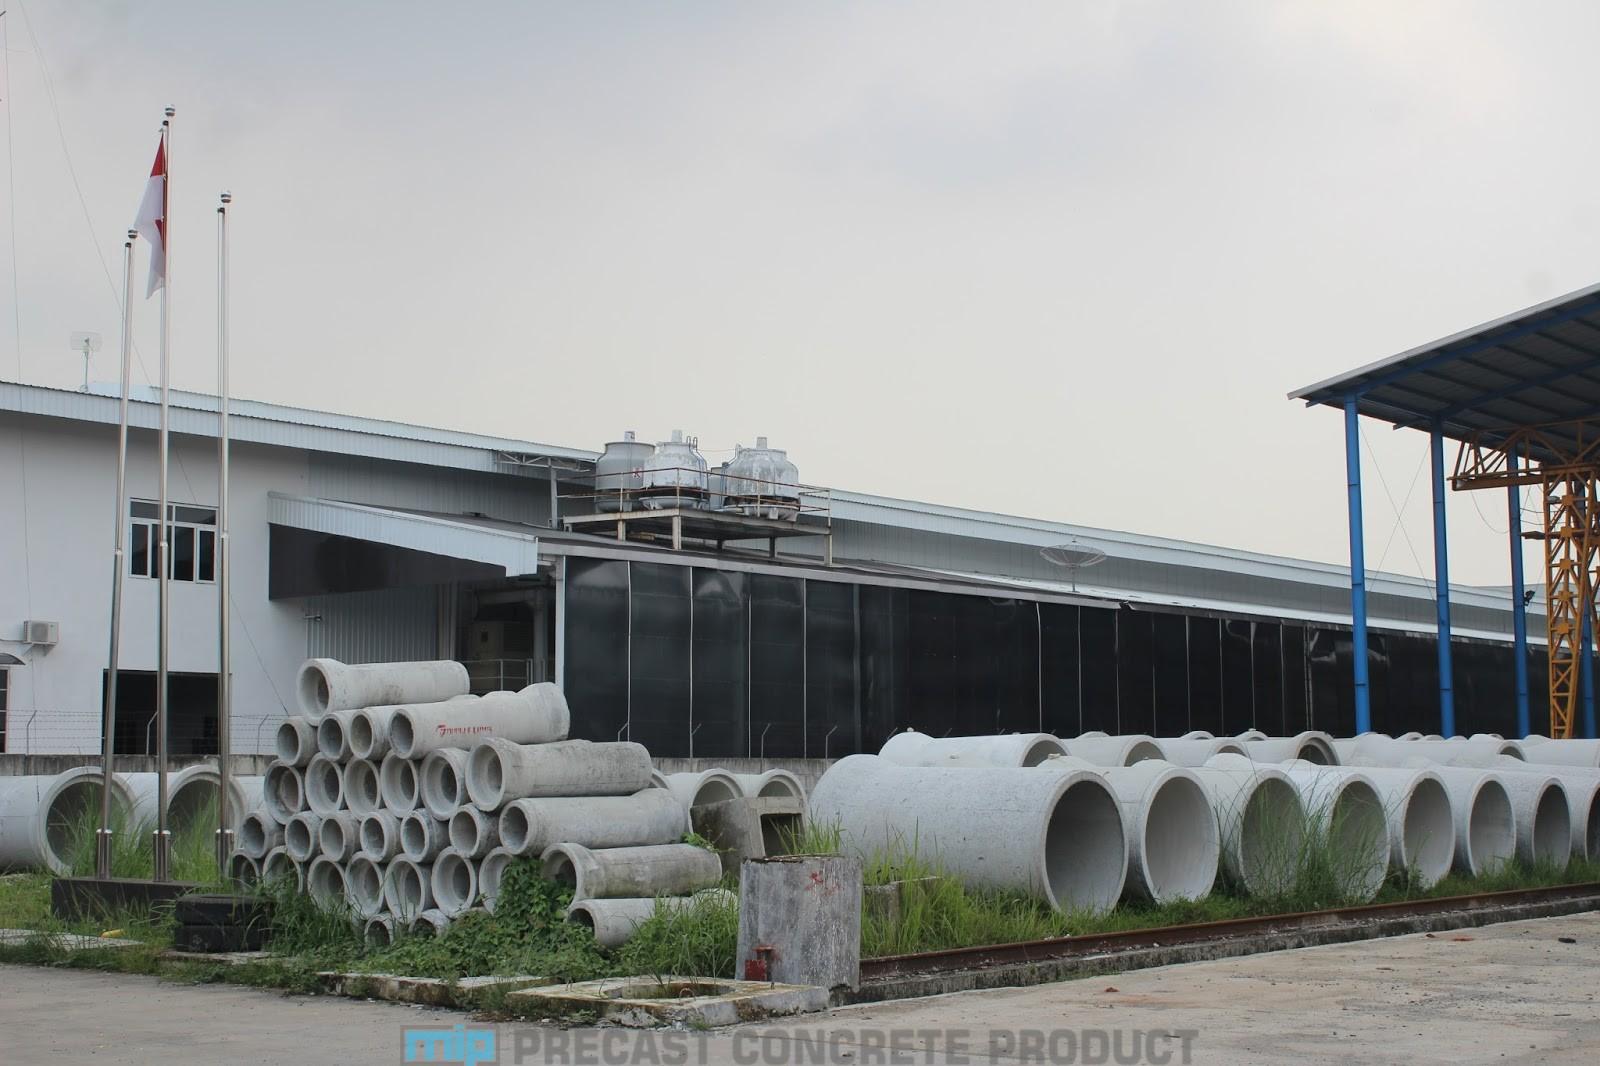 harga buis beton megacon Geyer Grobogan